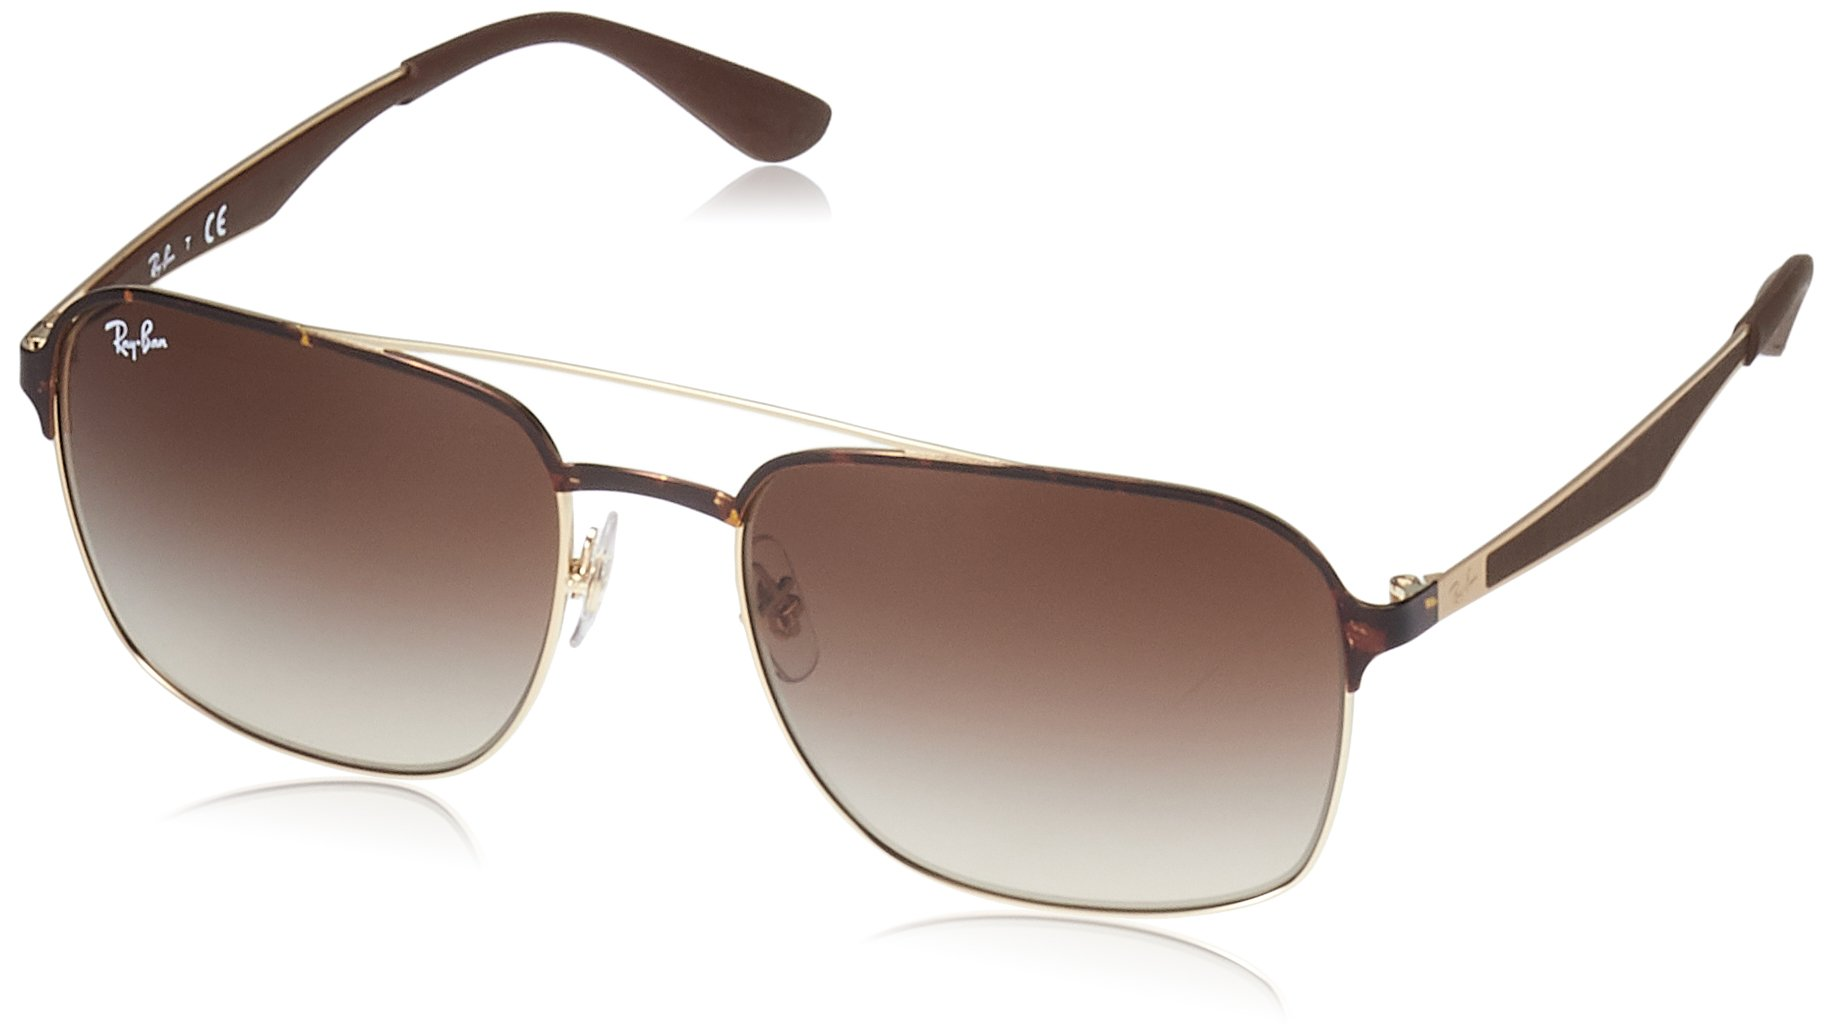 Ray-Ban Metal Unisex Square Sunglasses, Gold Top Havana, 58 mm